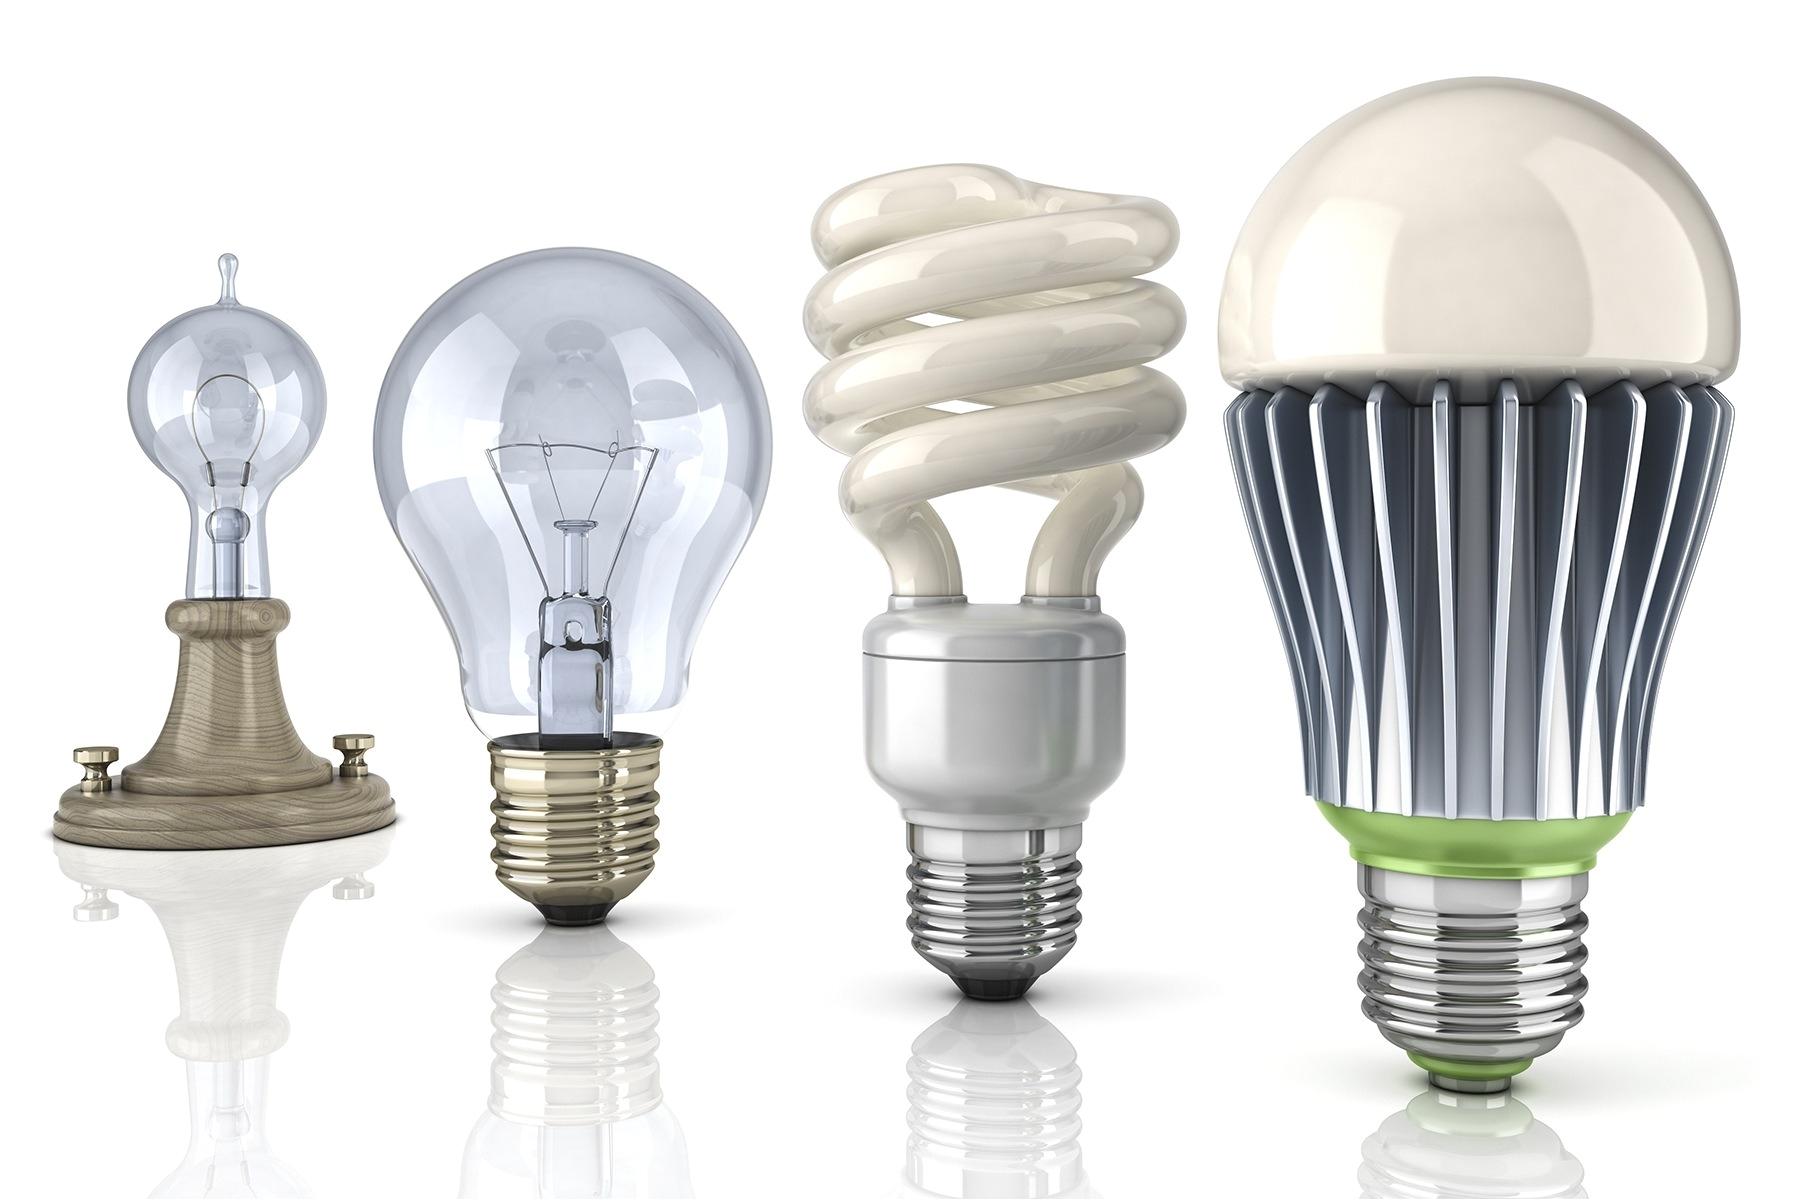 Fluorescent Light Bulbs Sizes Lovable Fluorescent Light Bulbs Sizes Metalorgtfo Com